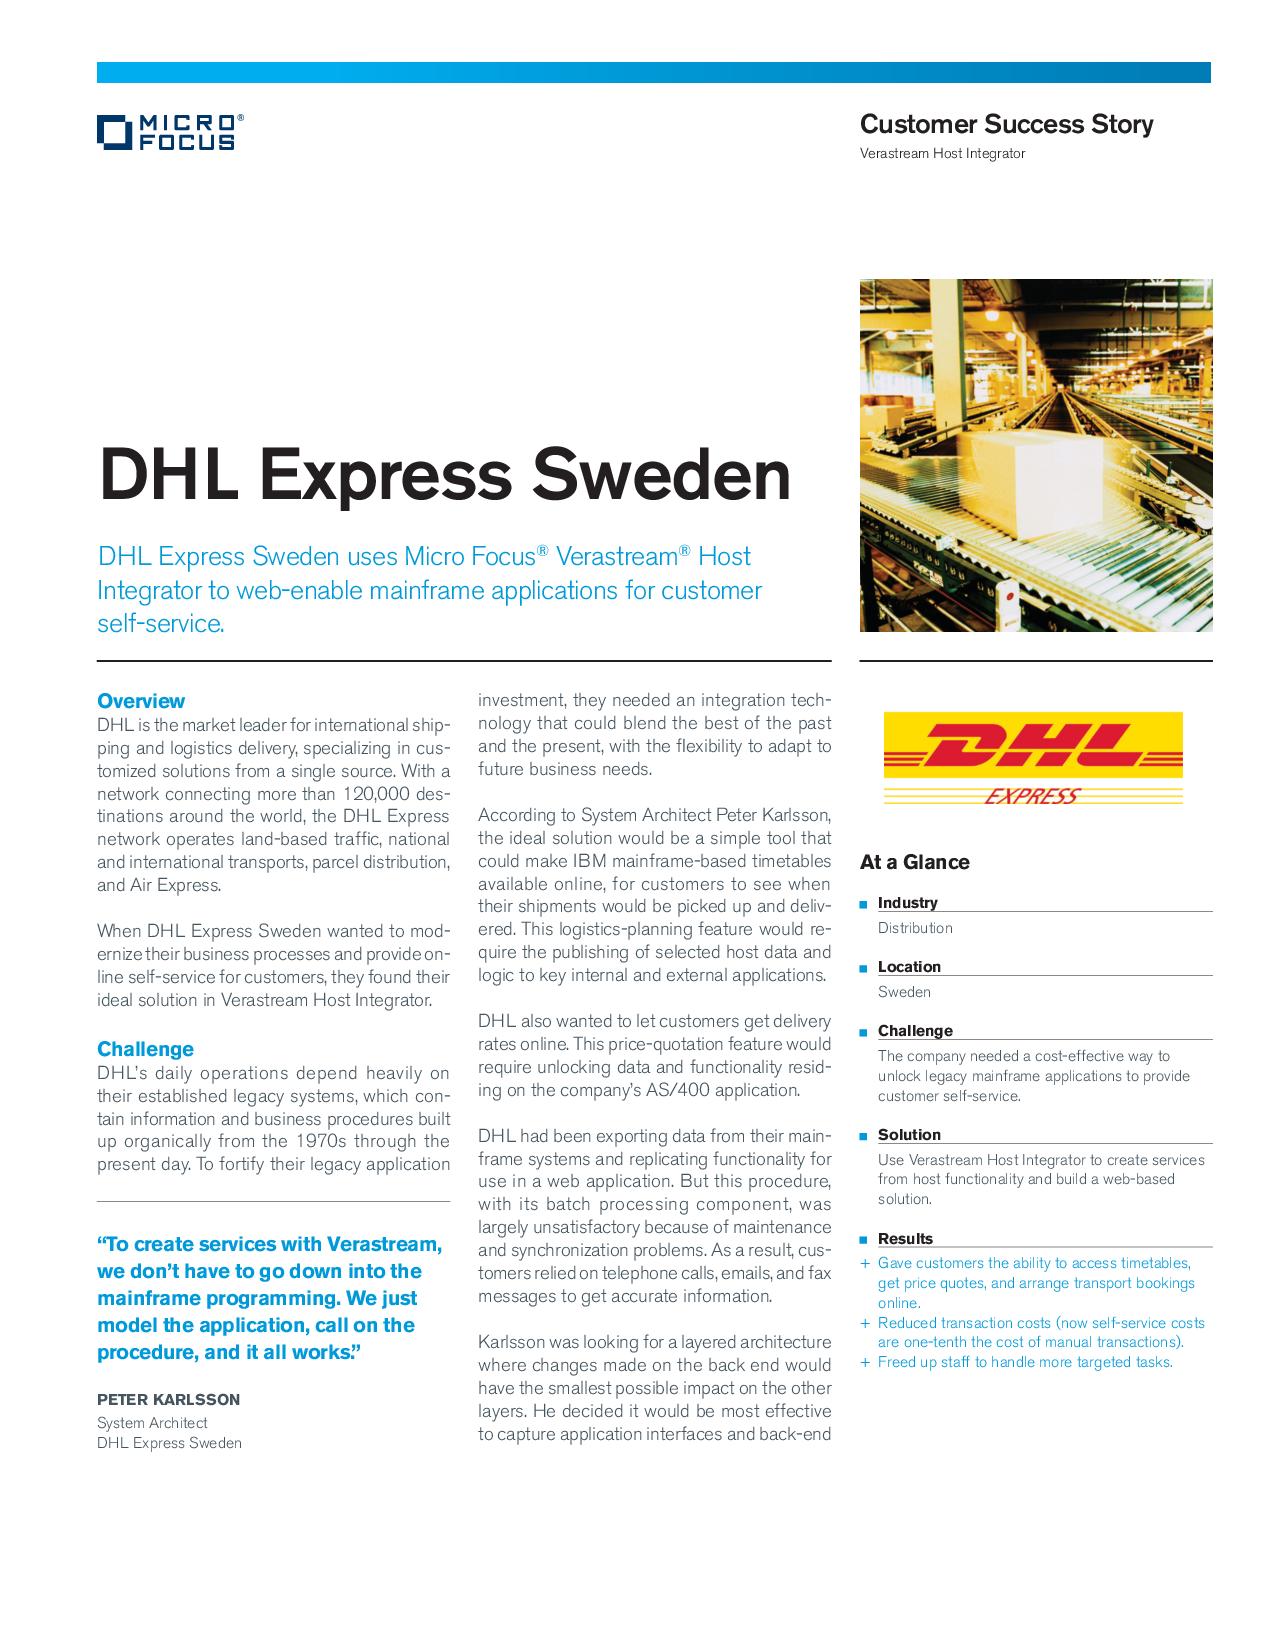 Dhl Express Sweden Uses Micro Focus Verastream Host Integr